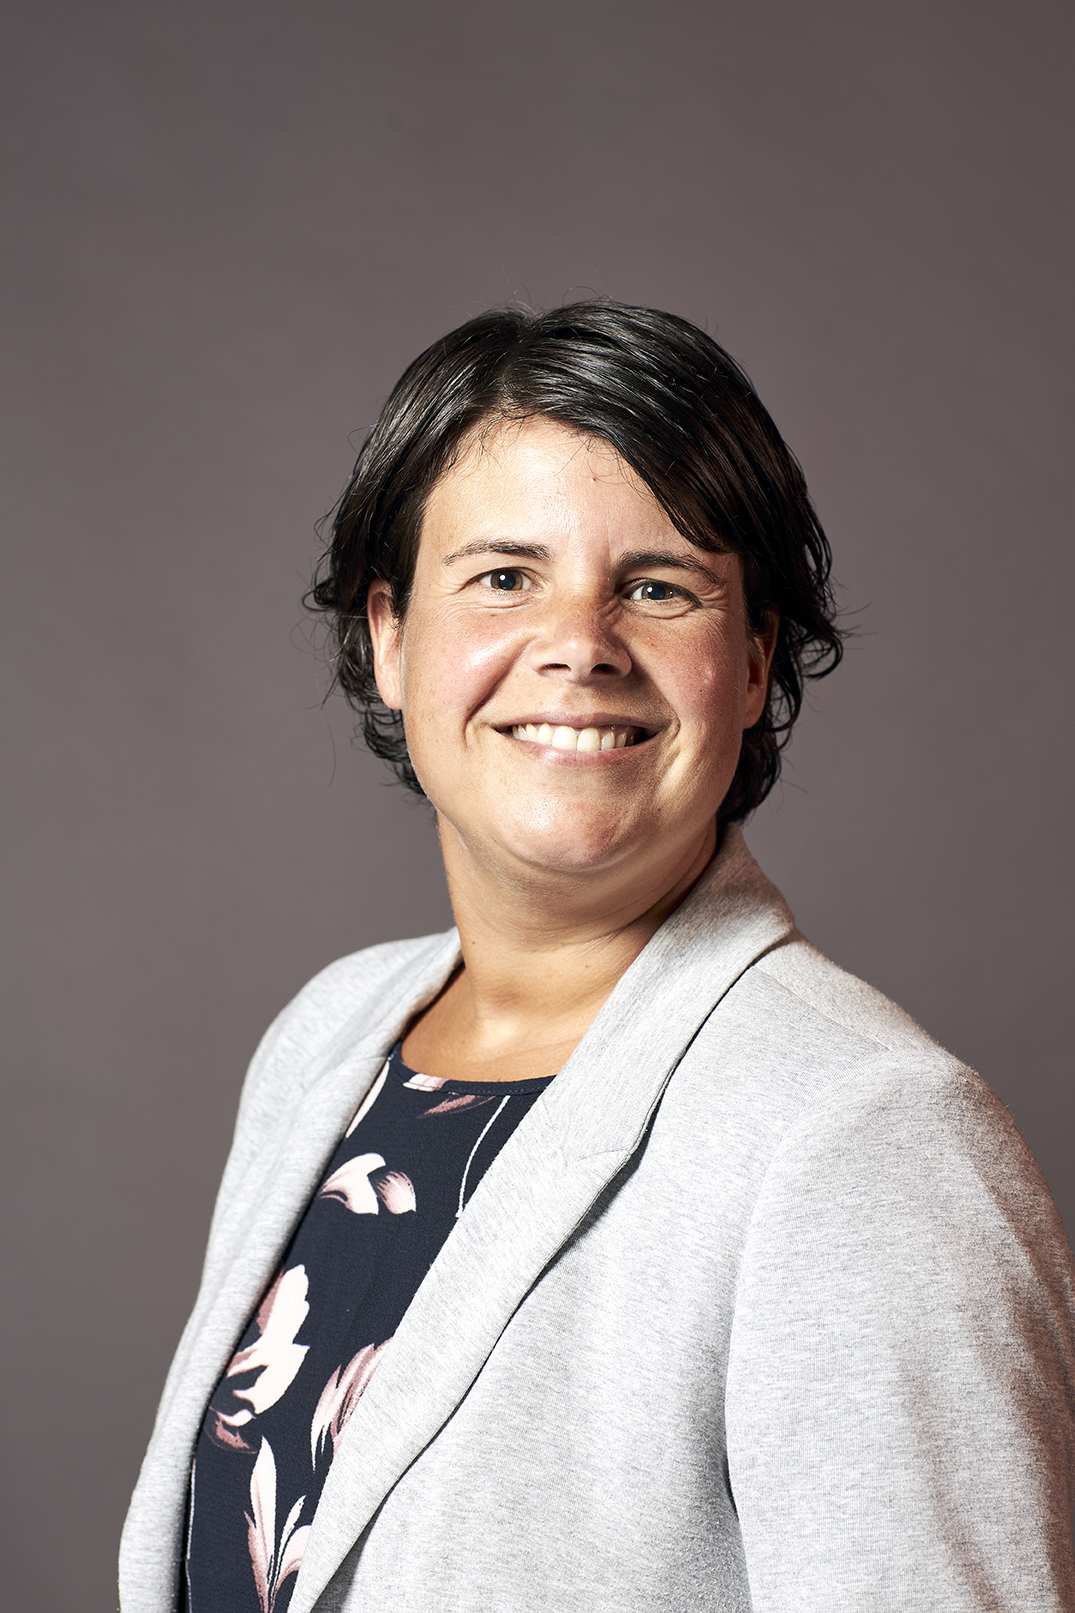 Wendy Schellekens